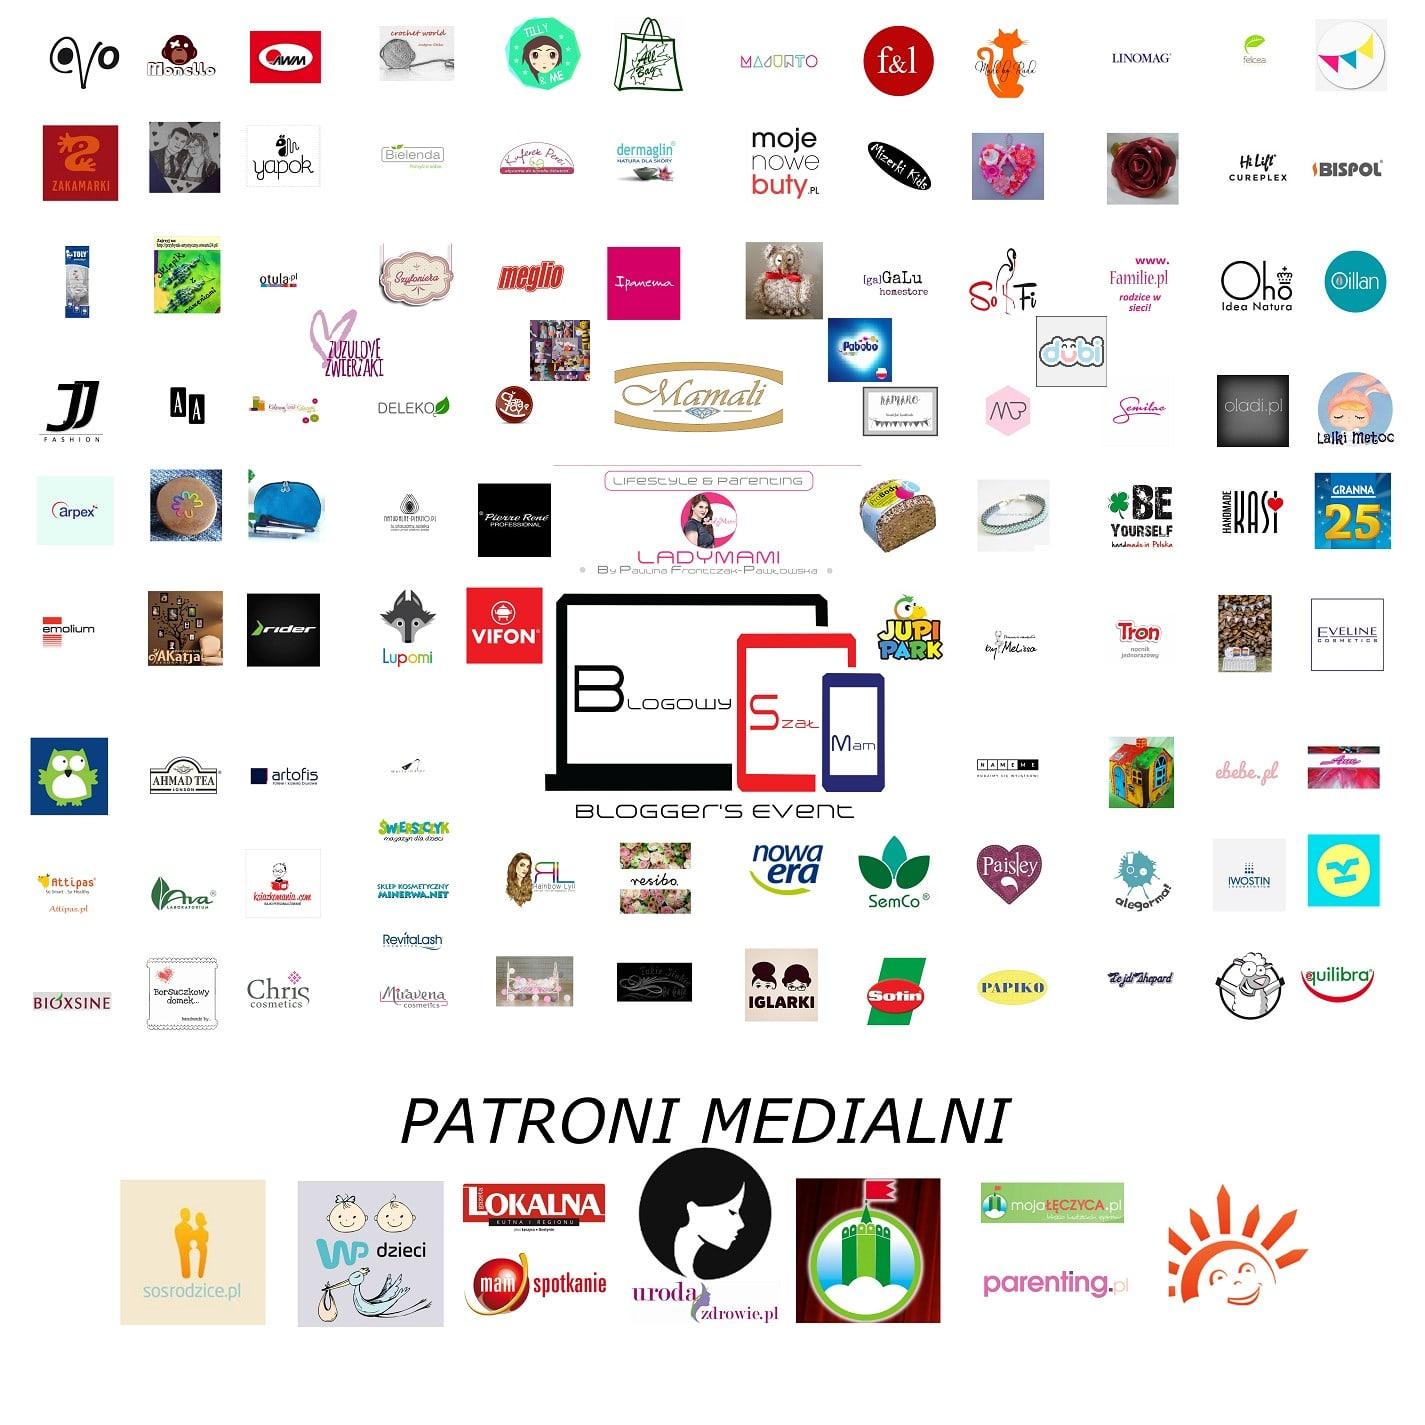 Blogowy Szła Mam 2016 plakat ze sponsorami